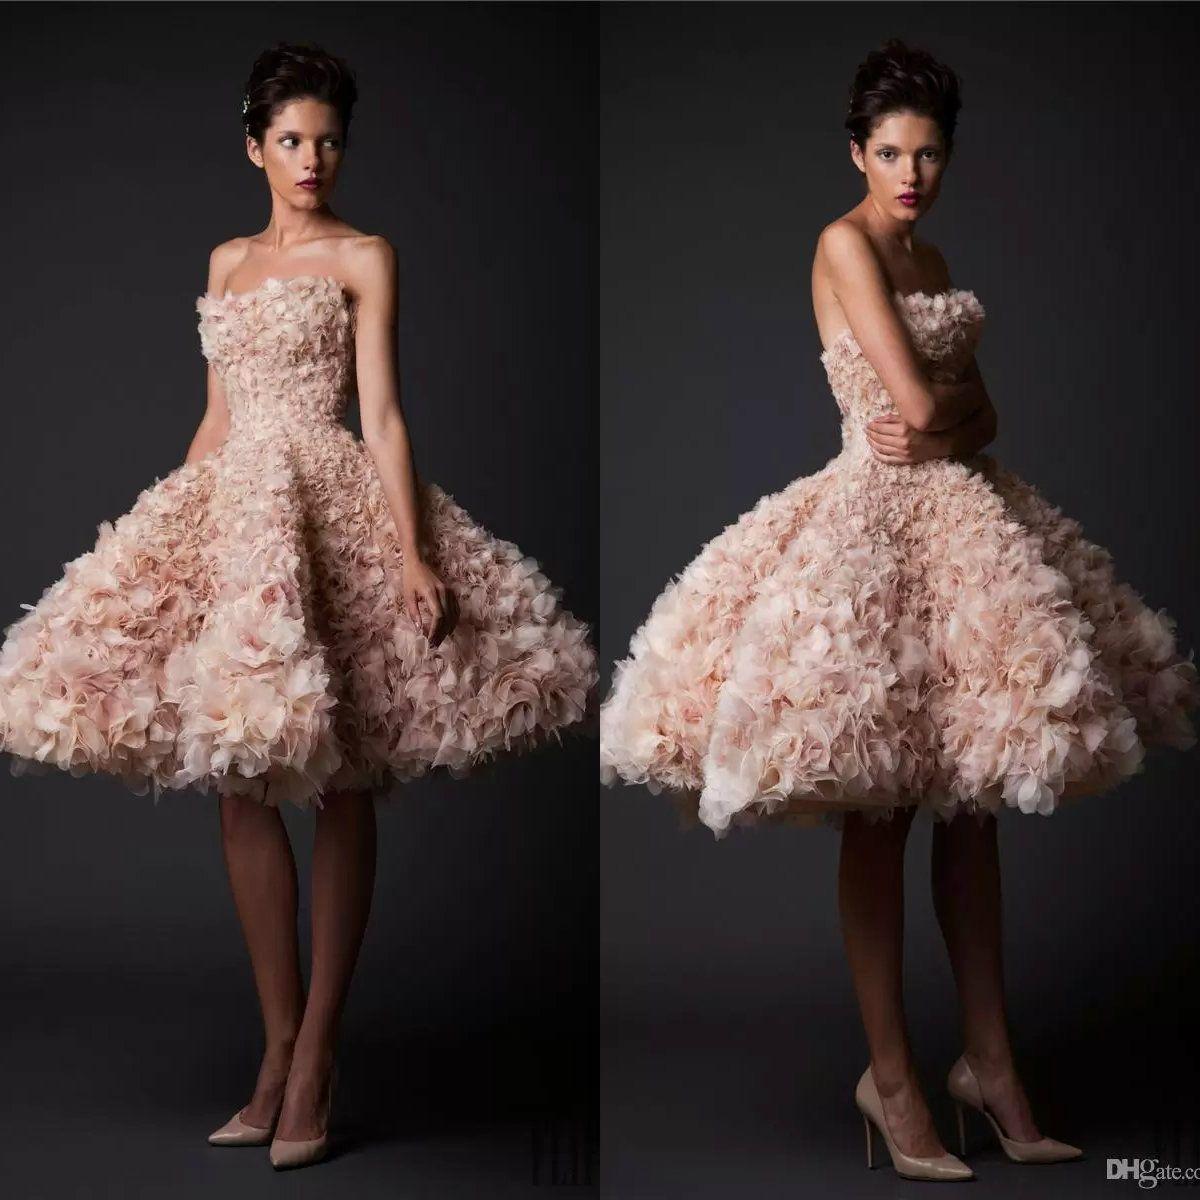 Krikor Jabotian Vintage Wedding Dresses Strapless Knee Length Short Bridal Gowns Tulle A-Line Plus Size Blush Wedding Dress